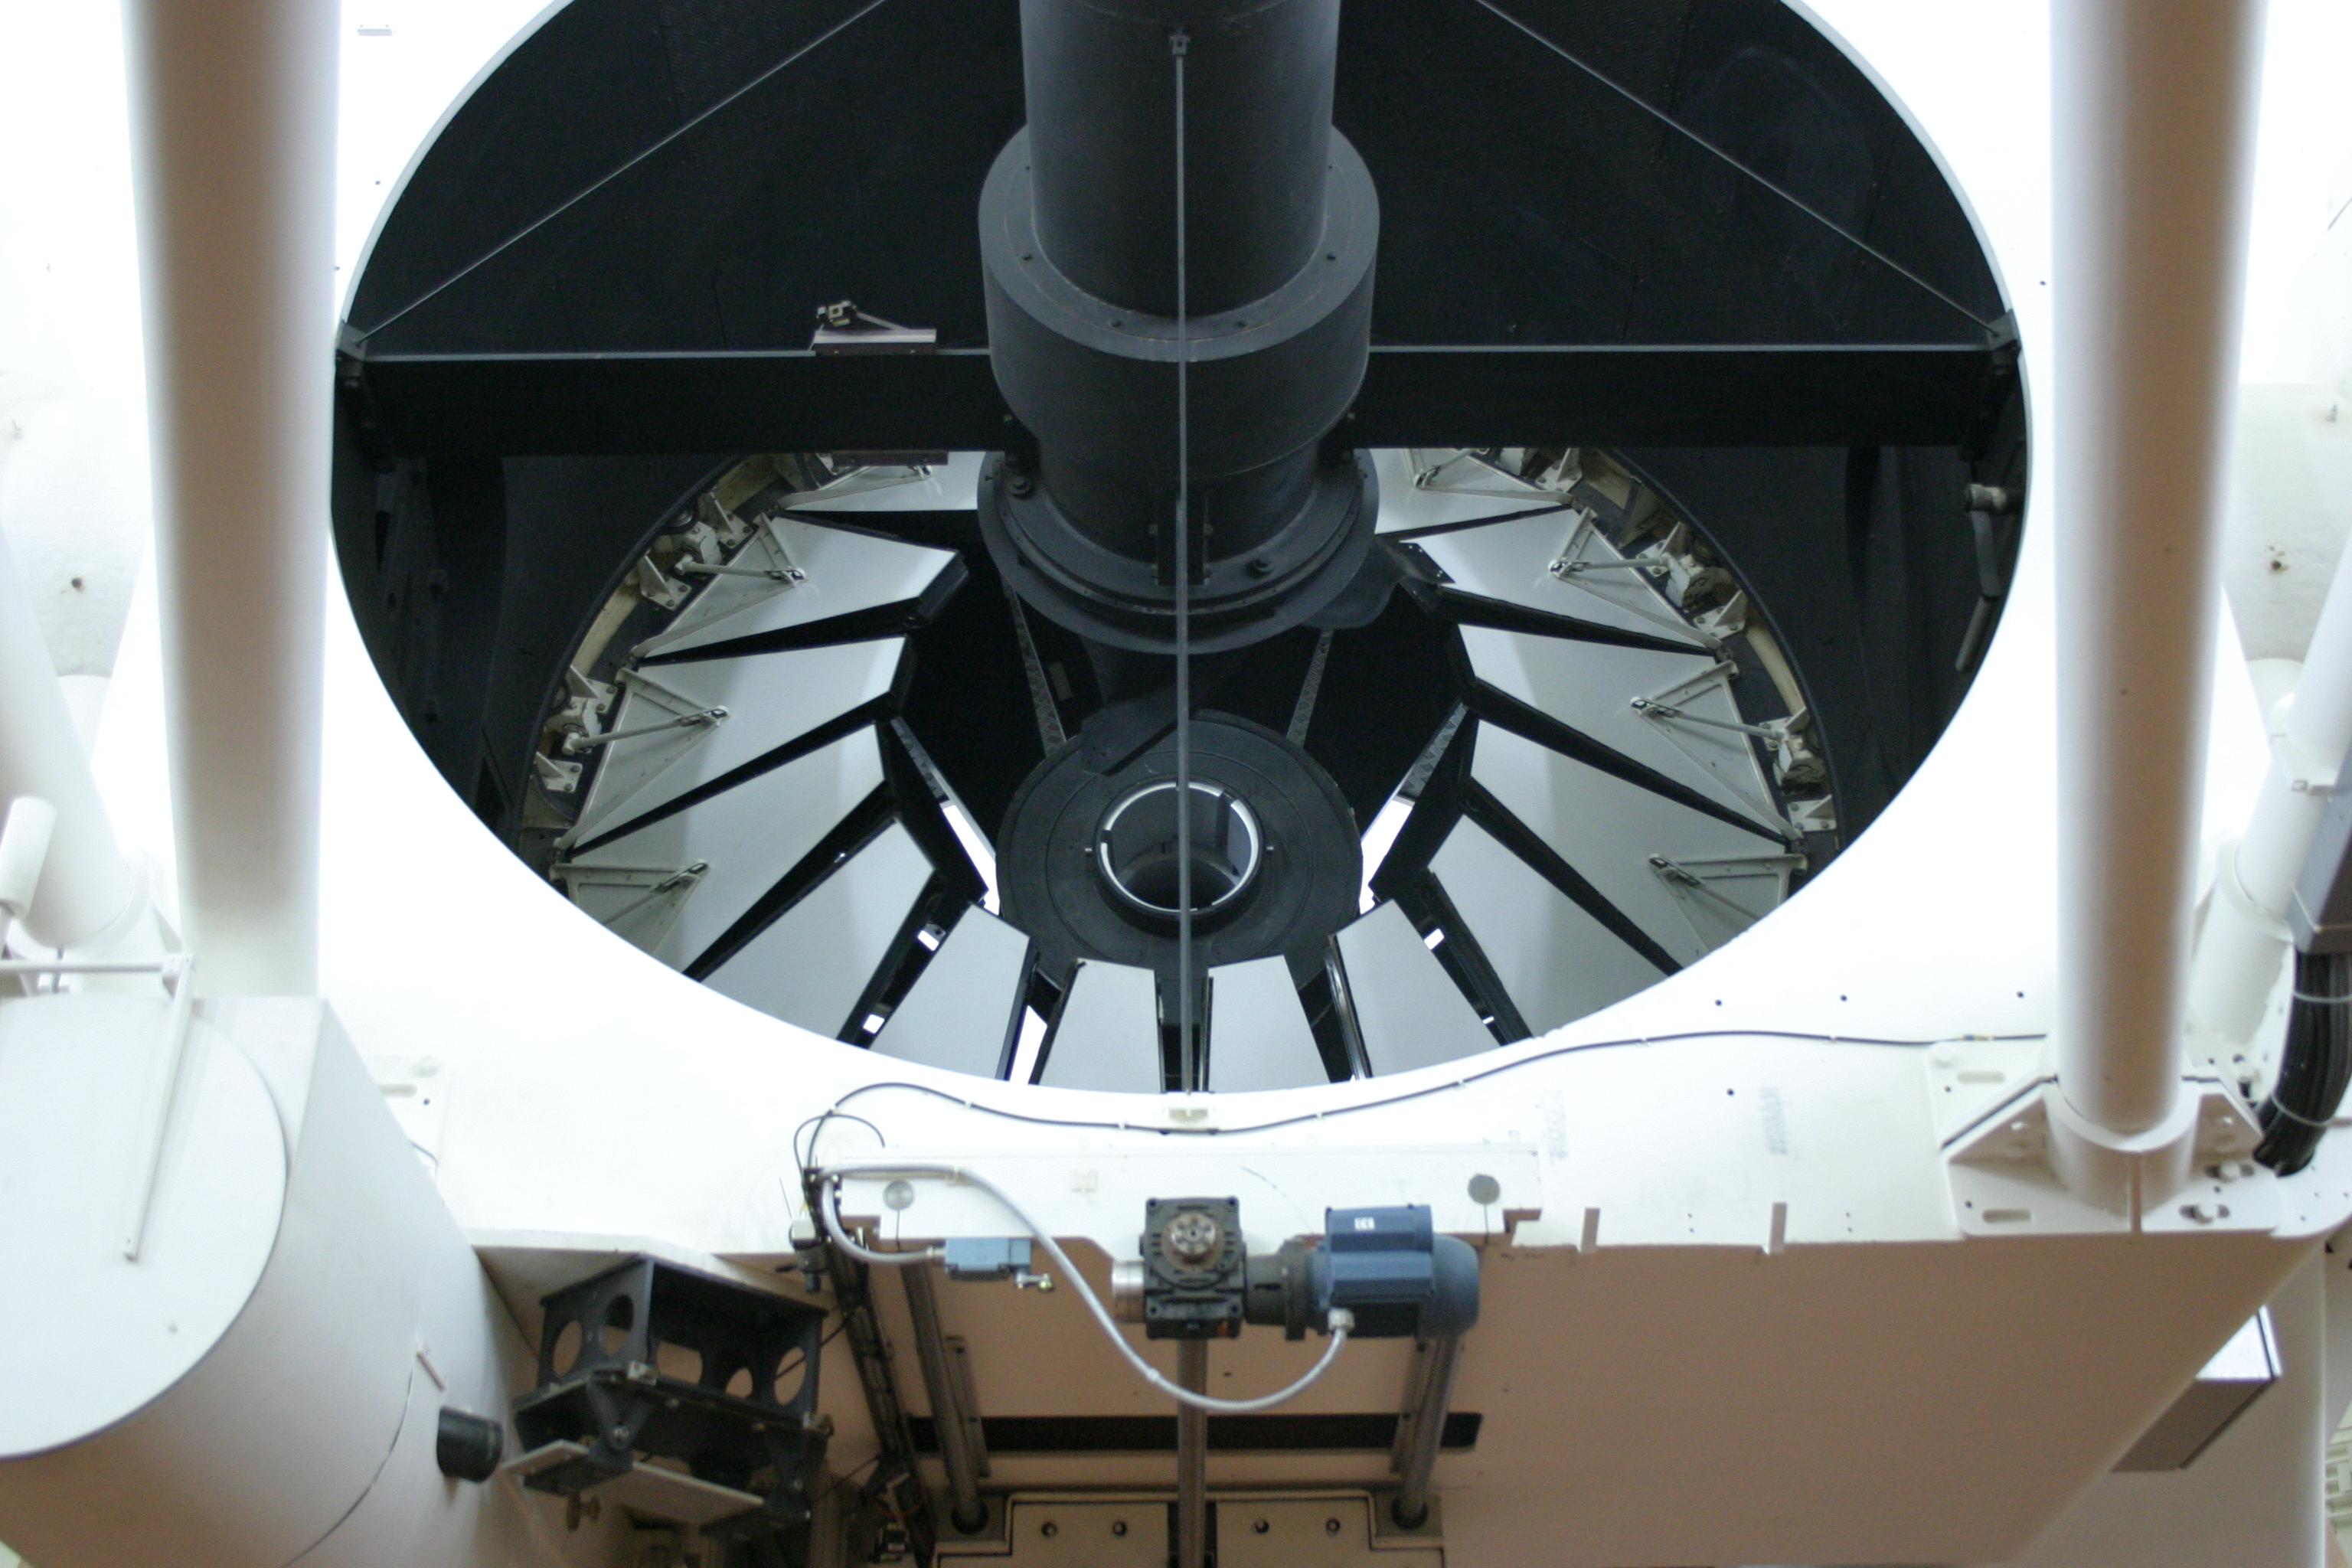 Teleskop express ts optics mm newton großfeld teleskop